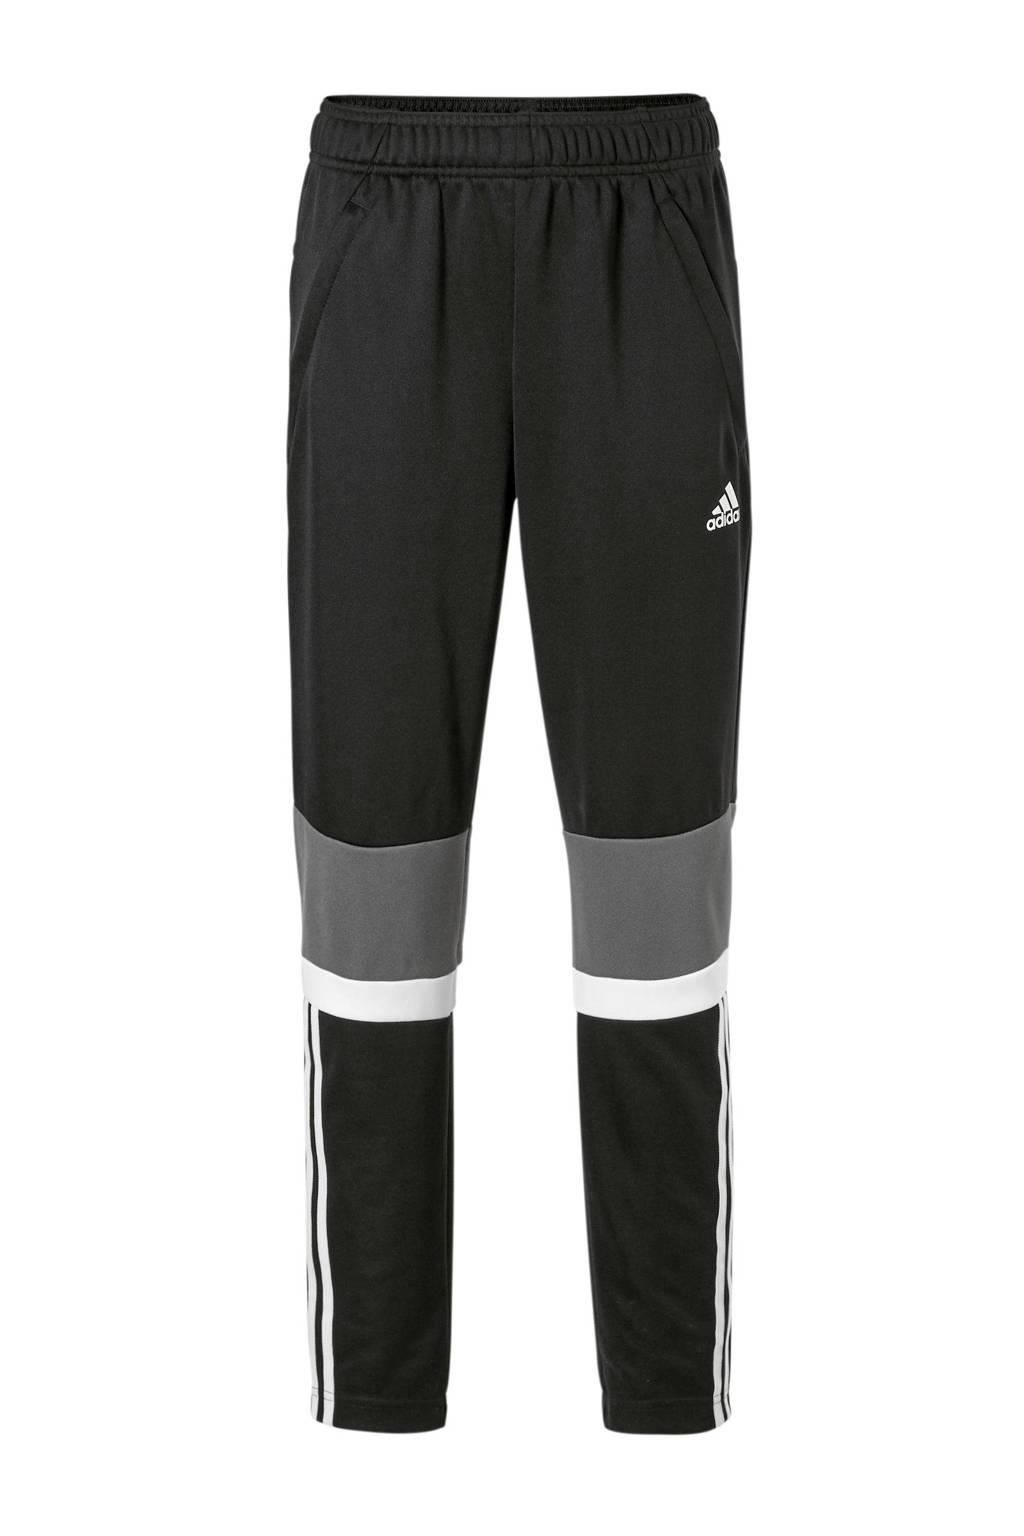 adidas performance   sportbroek zwart, Zwart/wit/grijs